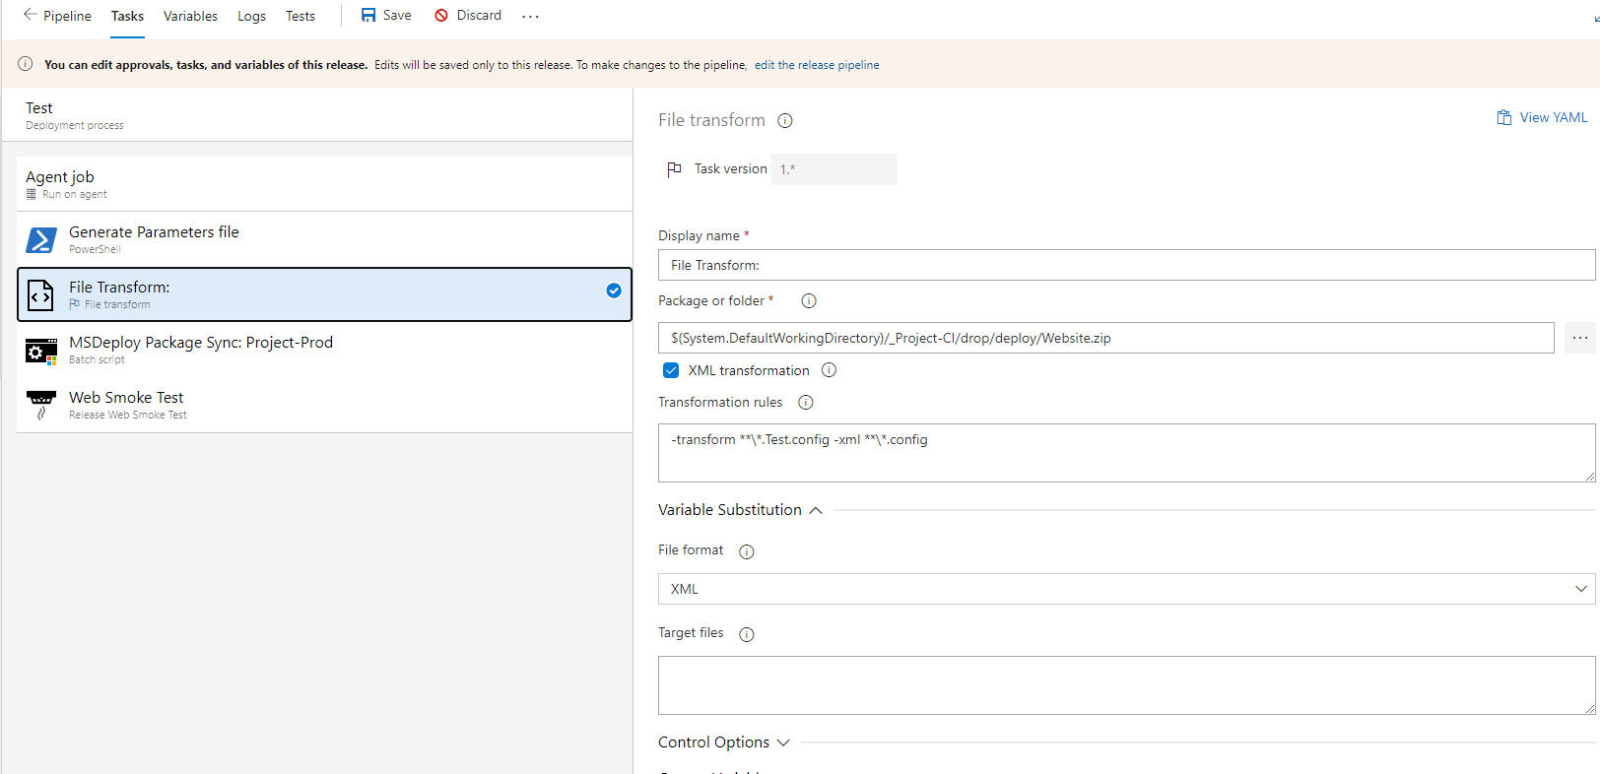 Transform a Web.config file in Azure Devops - -transform **\*.Test.config -xml **\*.config